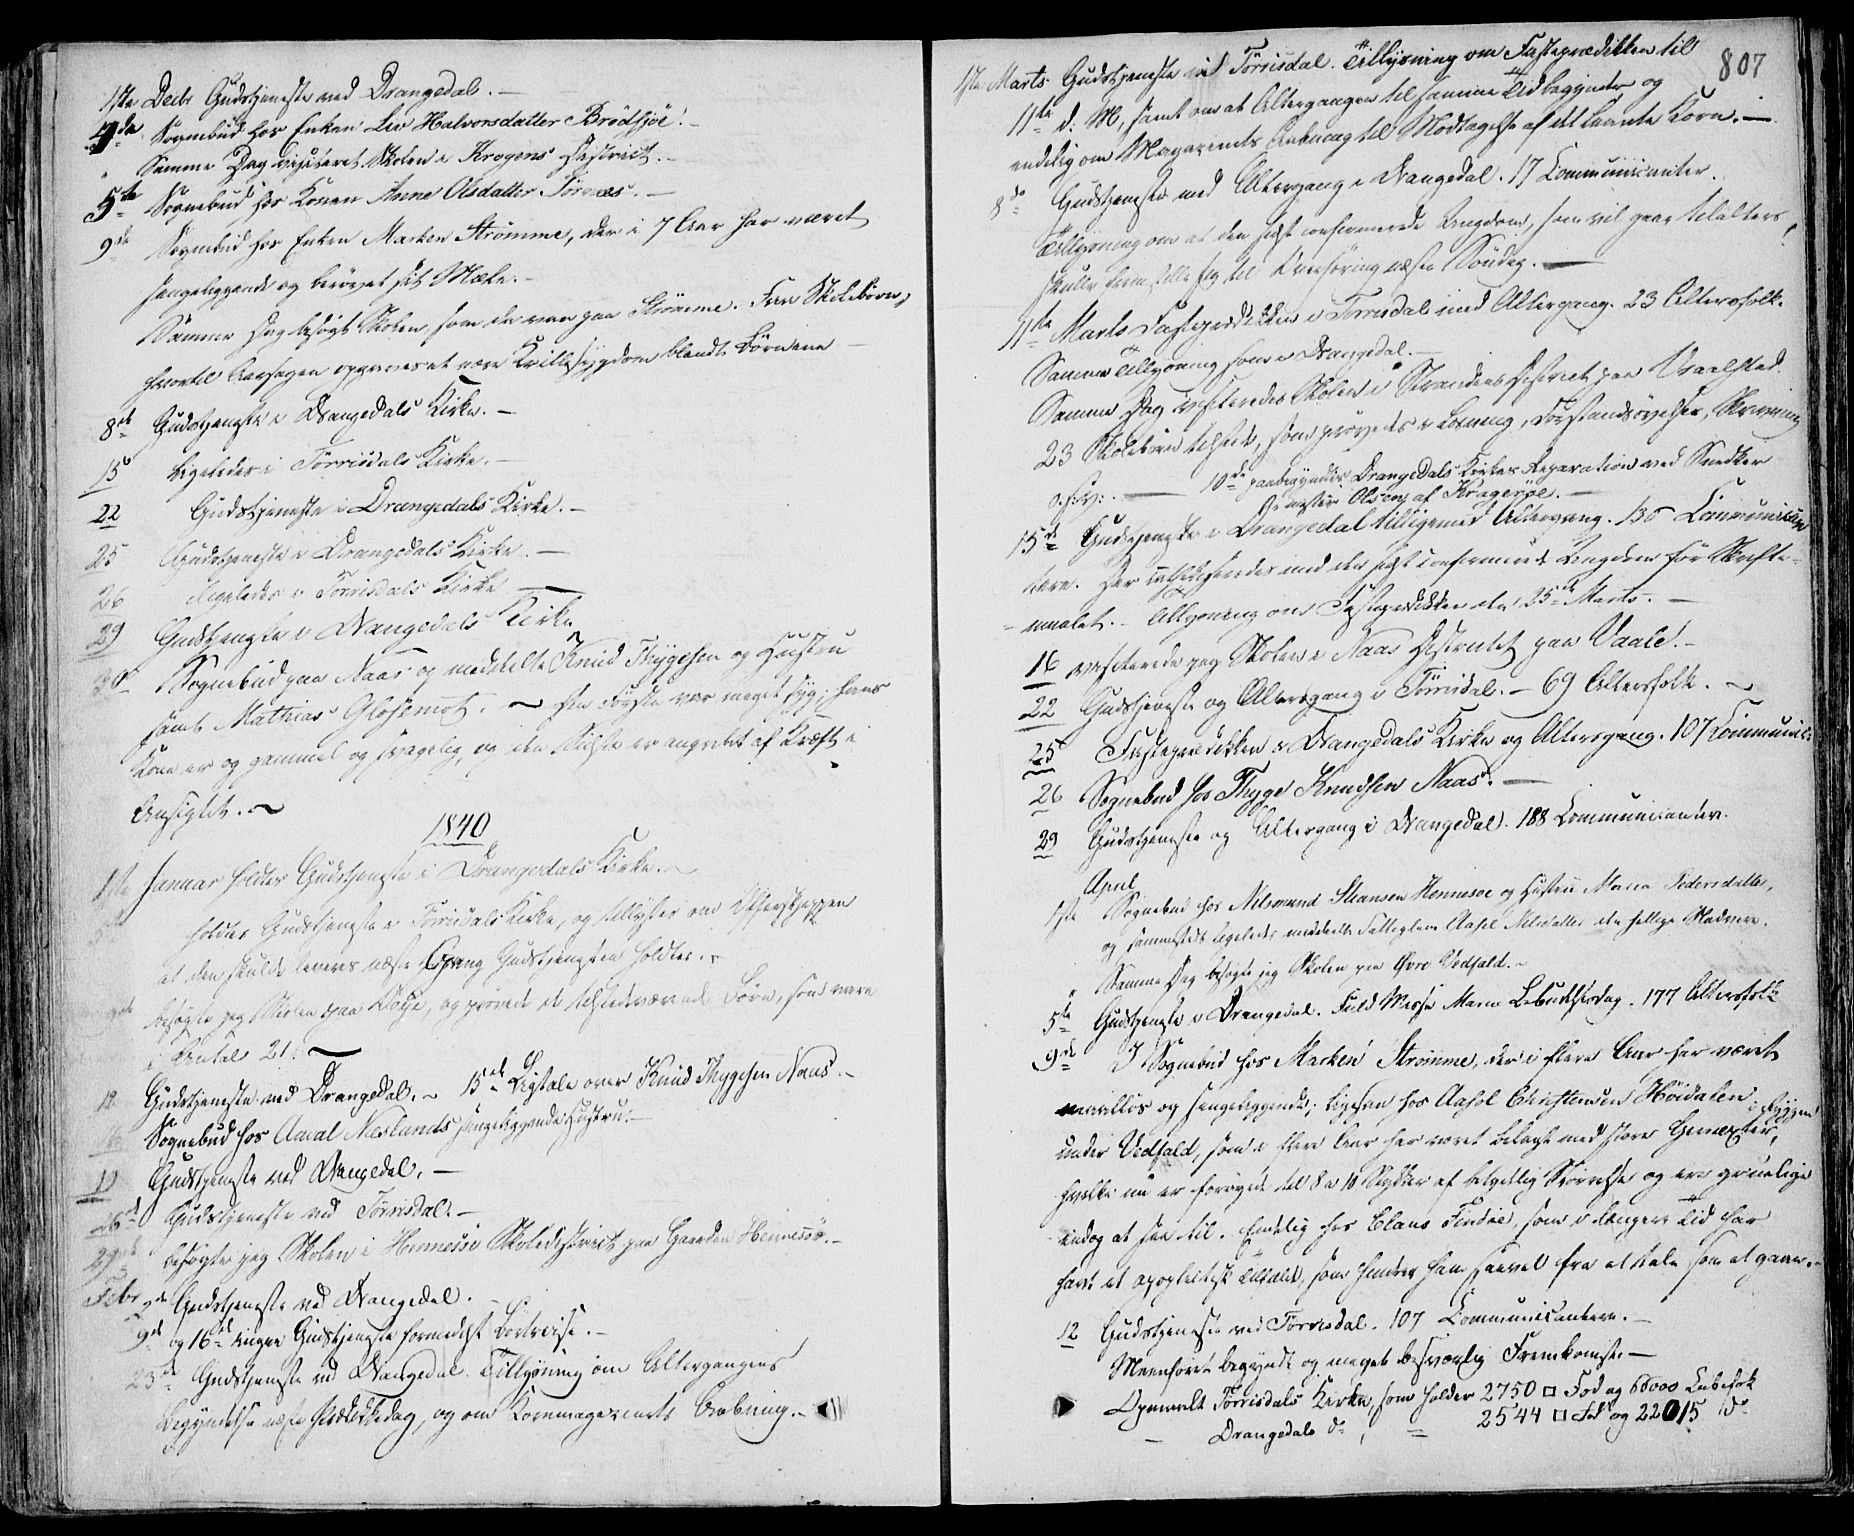 SAKO, Drangedal kirkebøker, F/Fa/L0007b: Ministerialbok nr. 7b, 1837-1856, s. 807